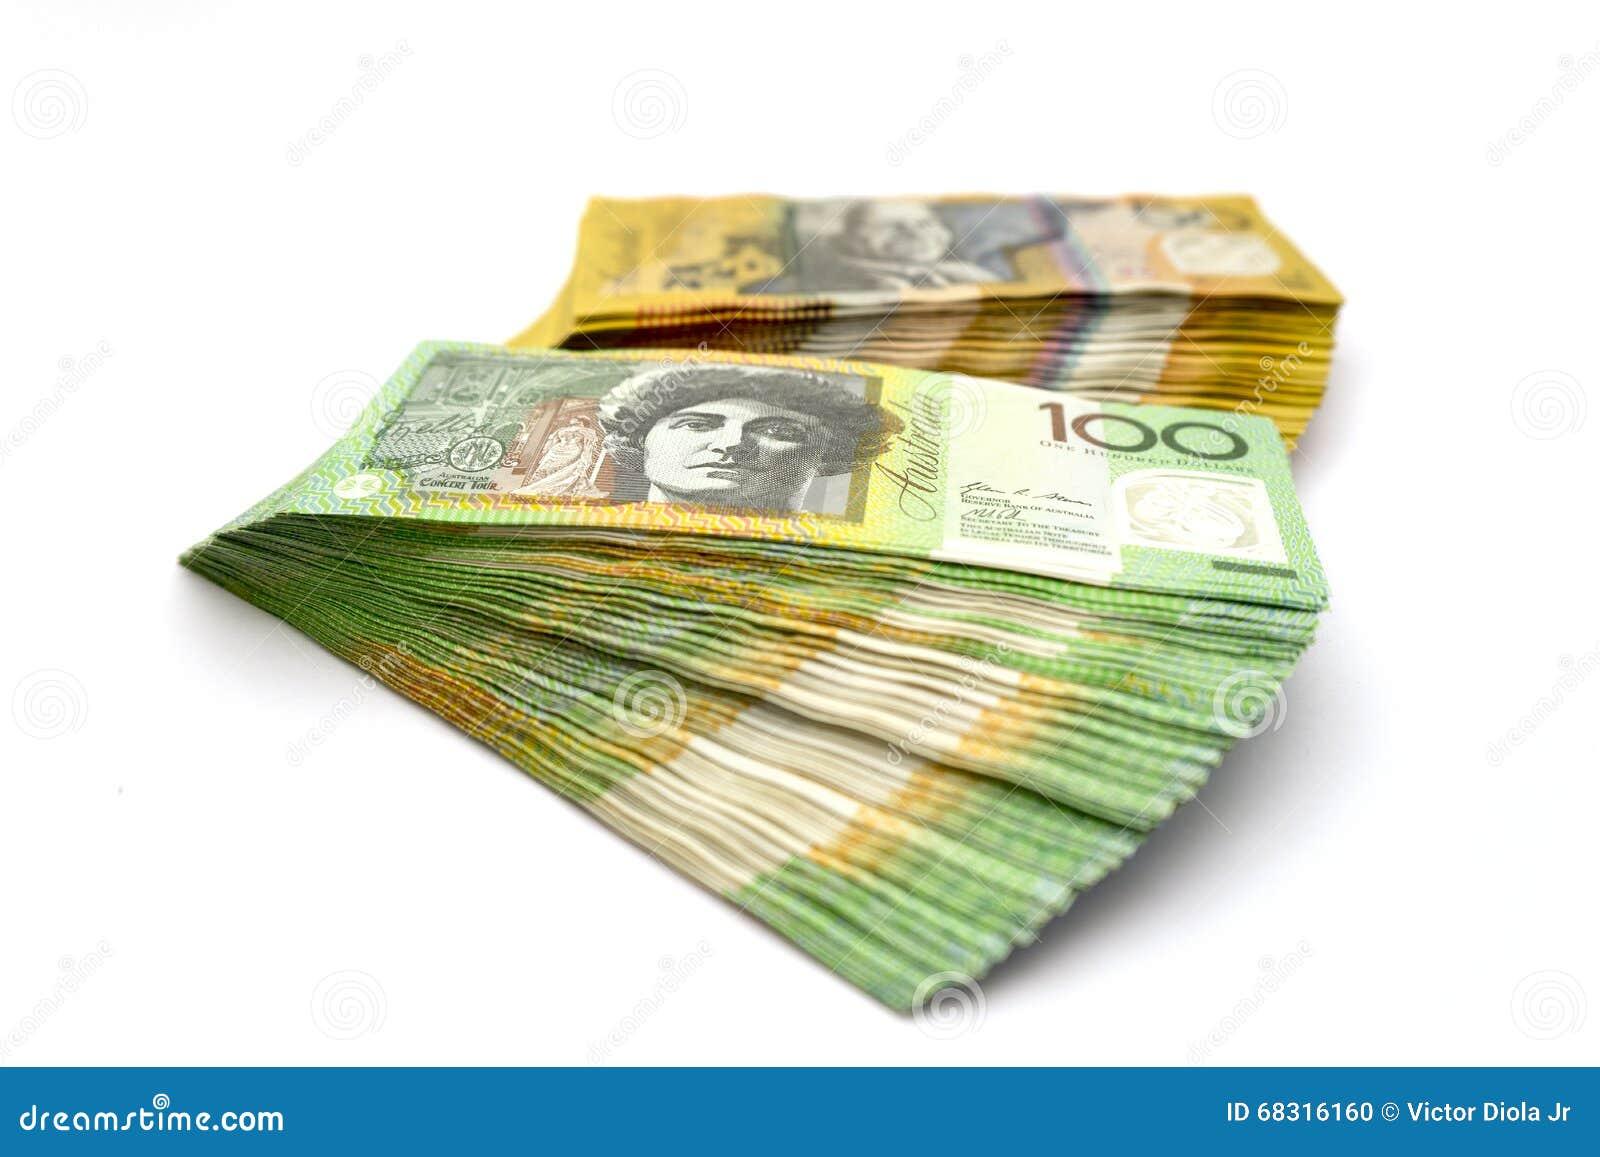 Download Australian One Hundred Dollar Bills And Fifty Dollar Bills Stock Photo - Image of australia, green: 68316160